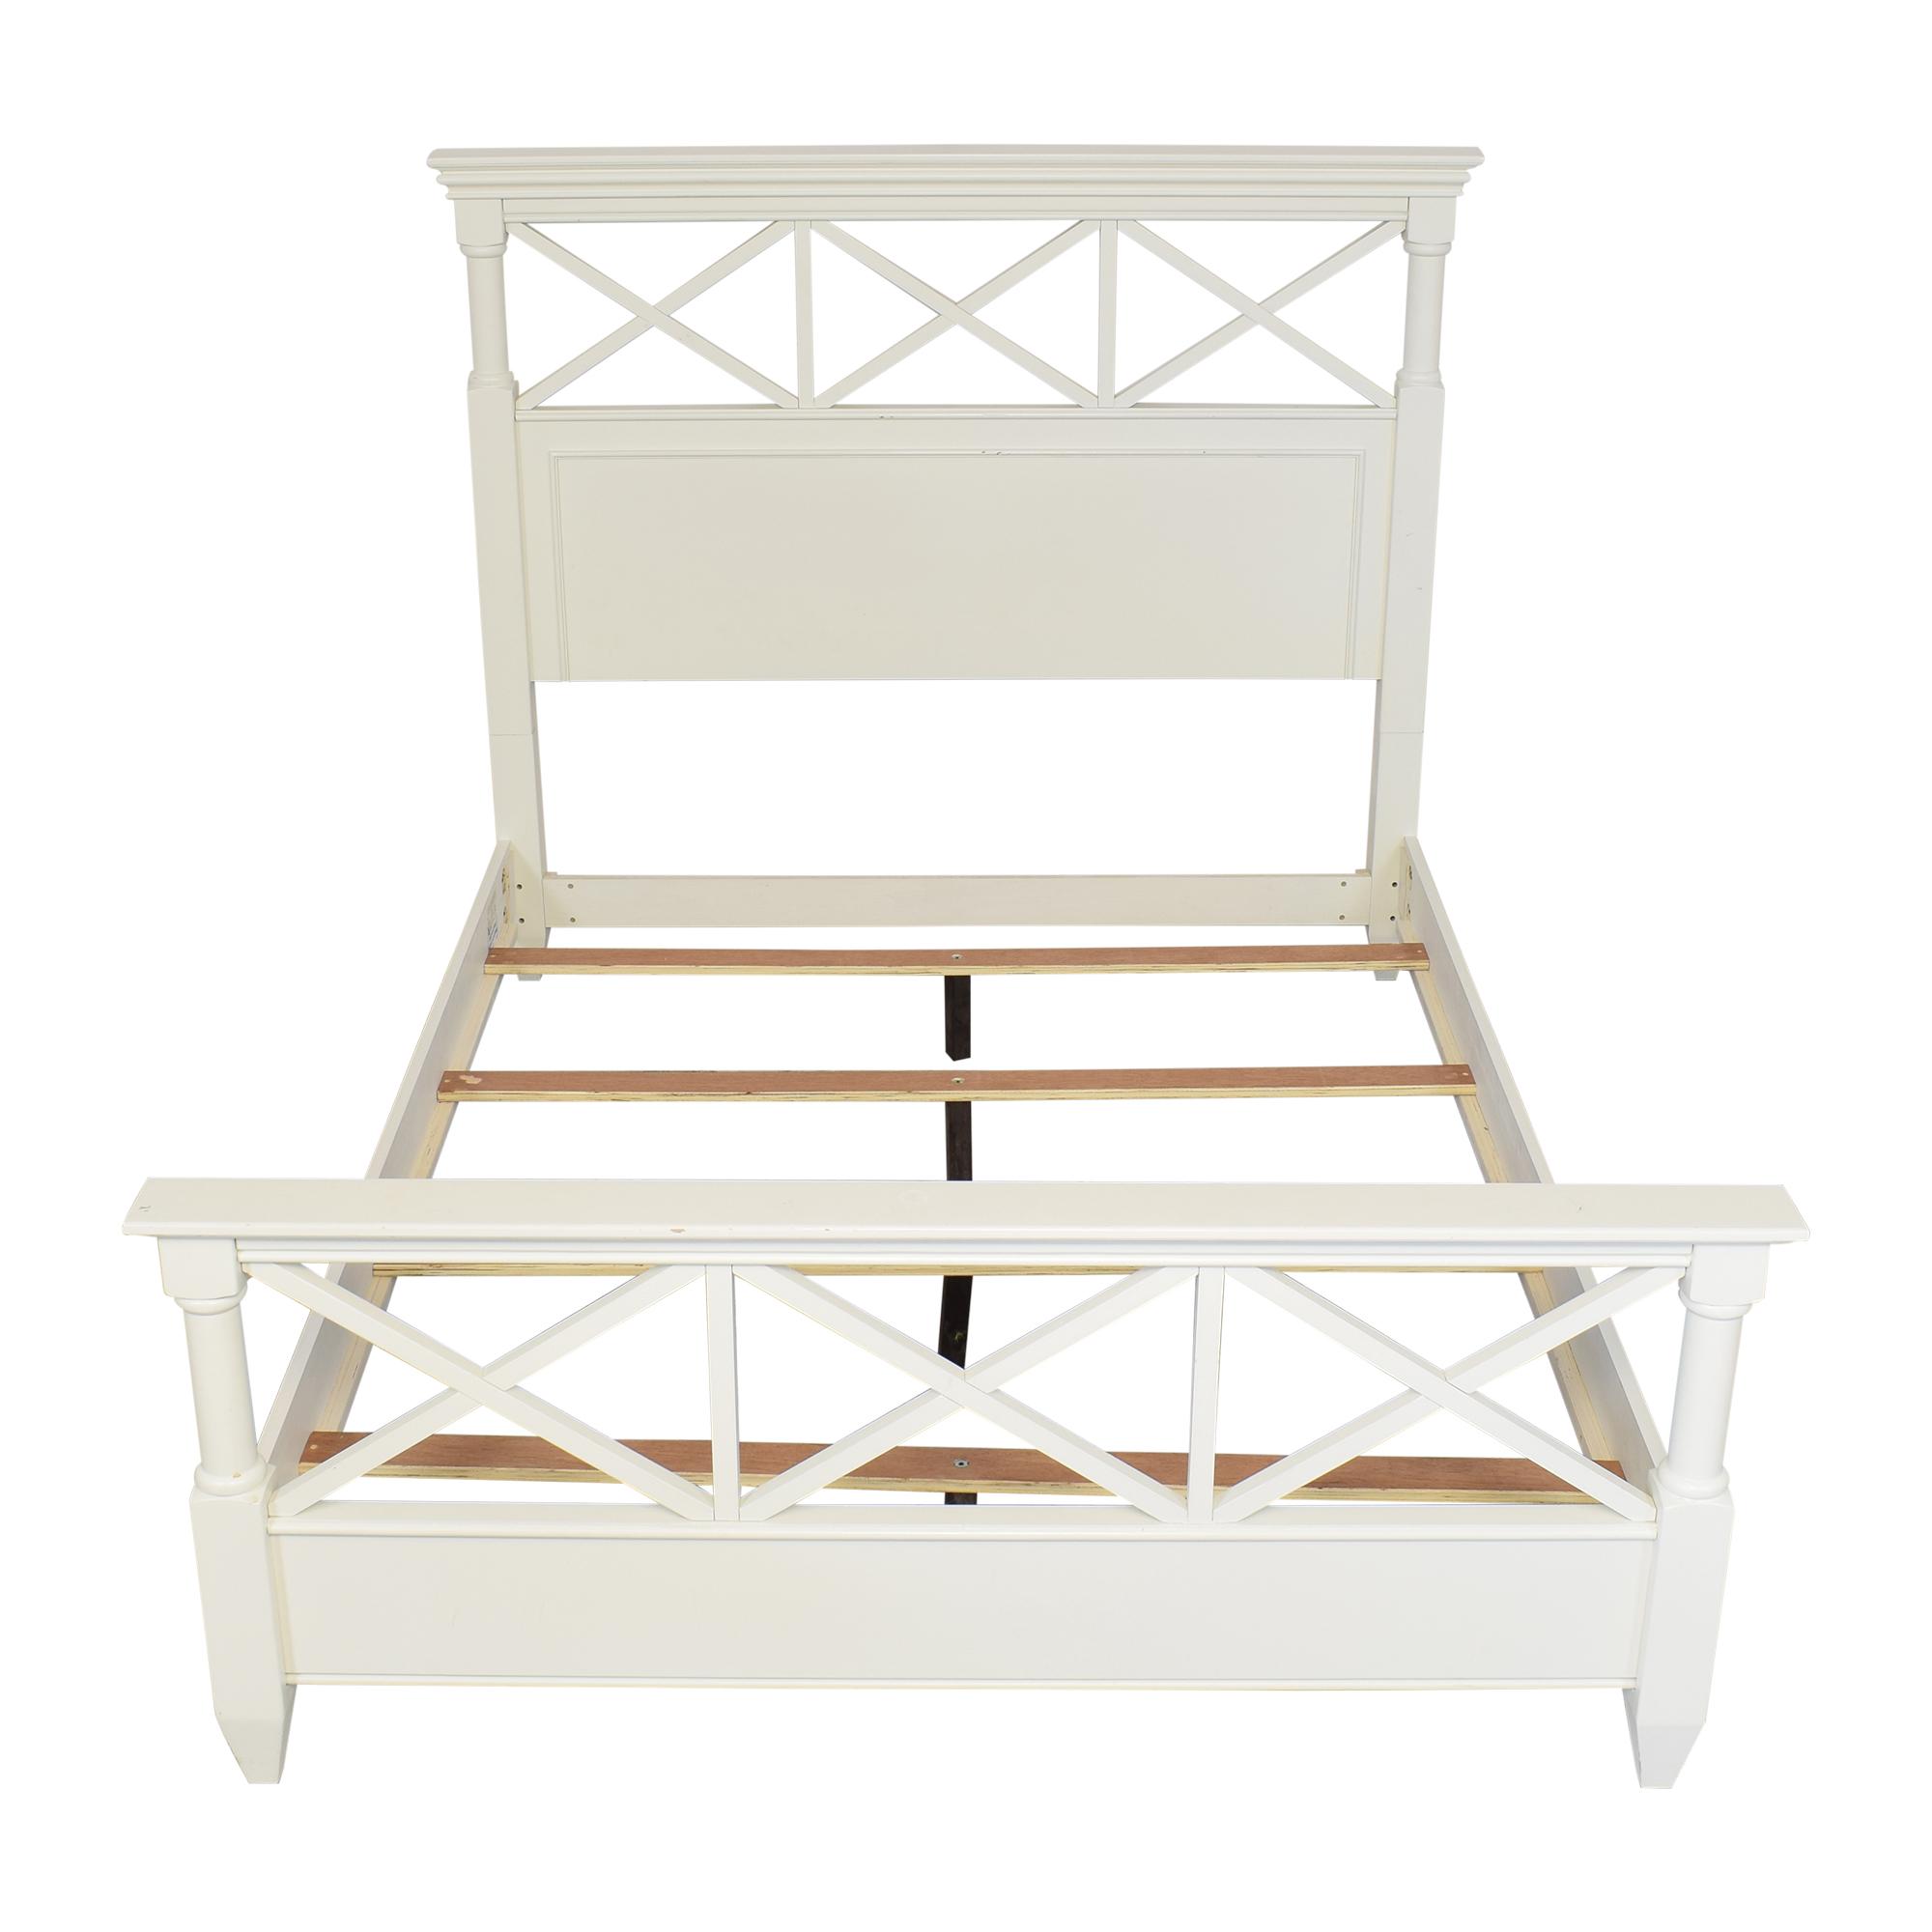 shop Magnussen Home Magnussen Home Queen Bed Frame online